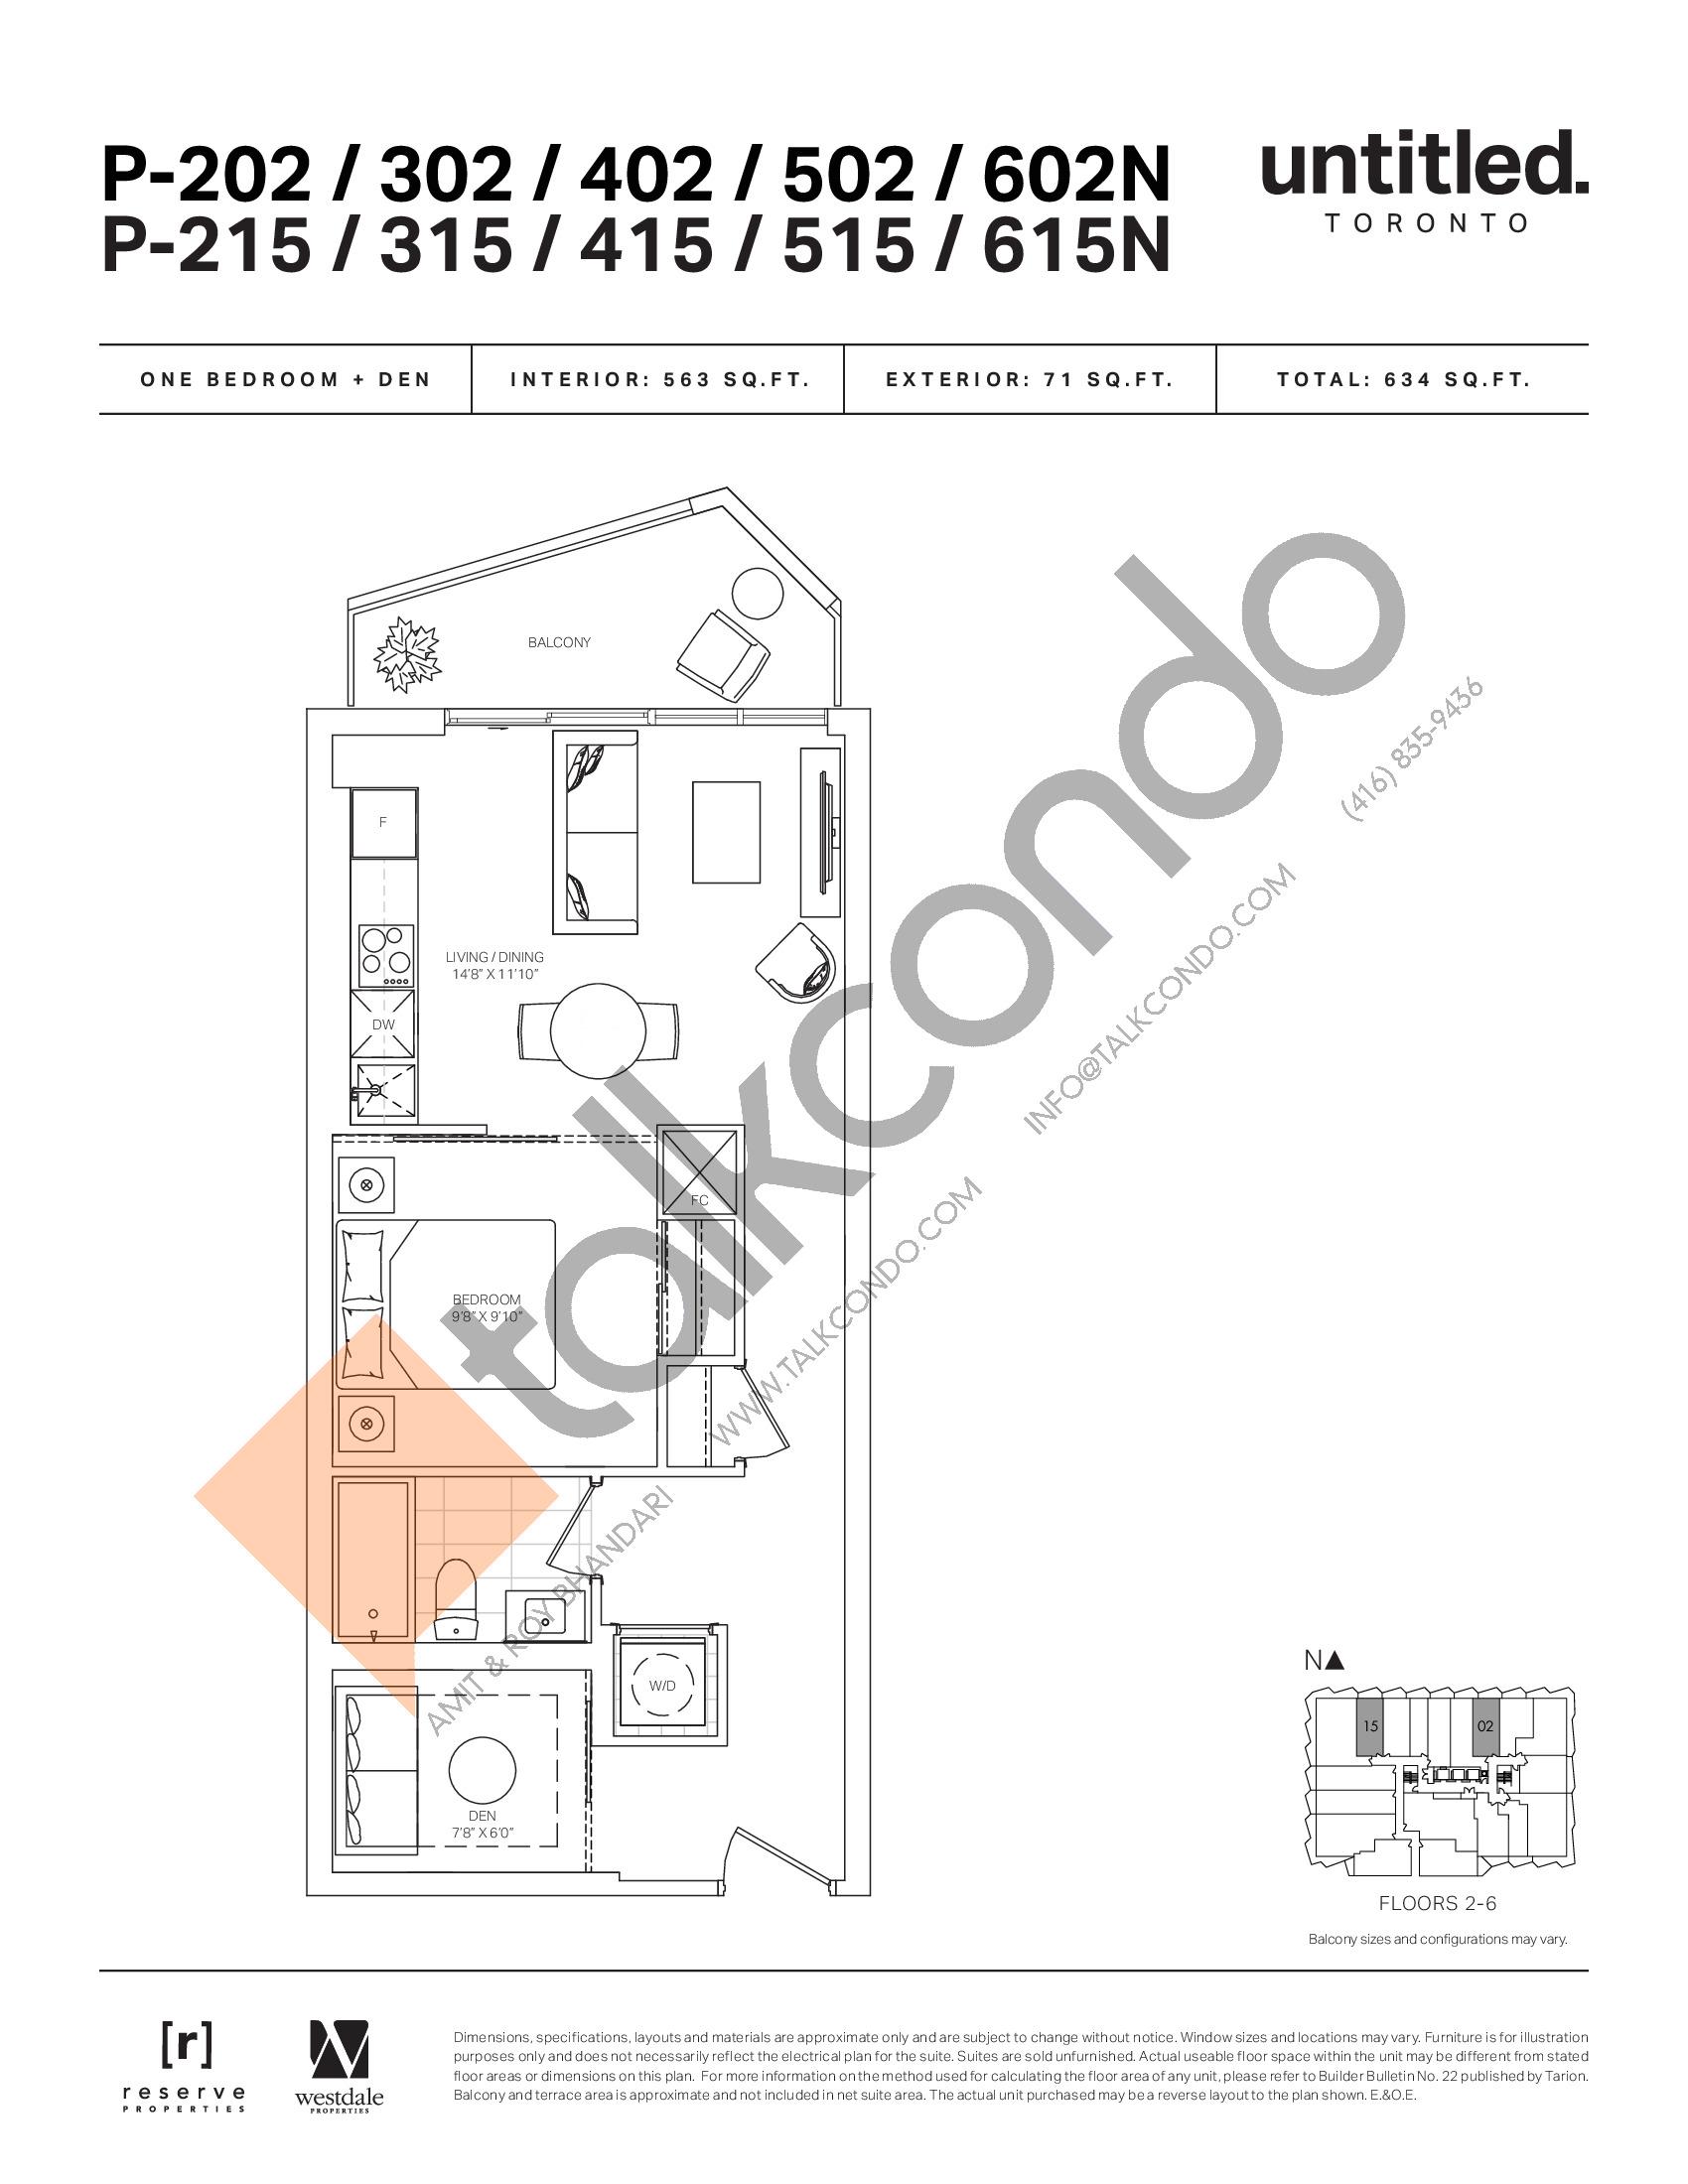 P-202/302/402/502/602N P-215/315/415/515/615N Floor Plan at Untitled North Tower Condos - 563 sq.ft